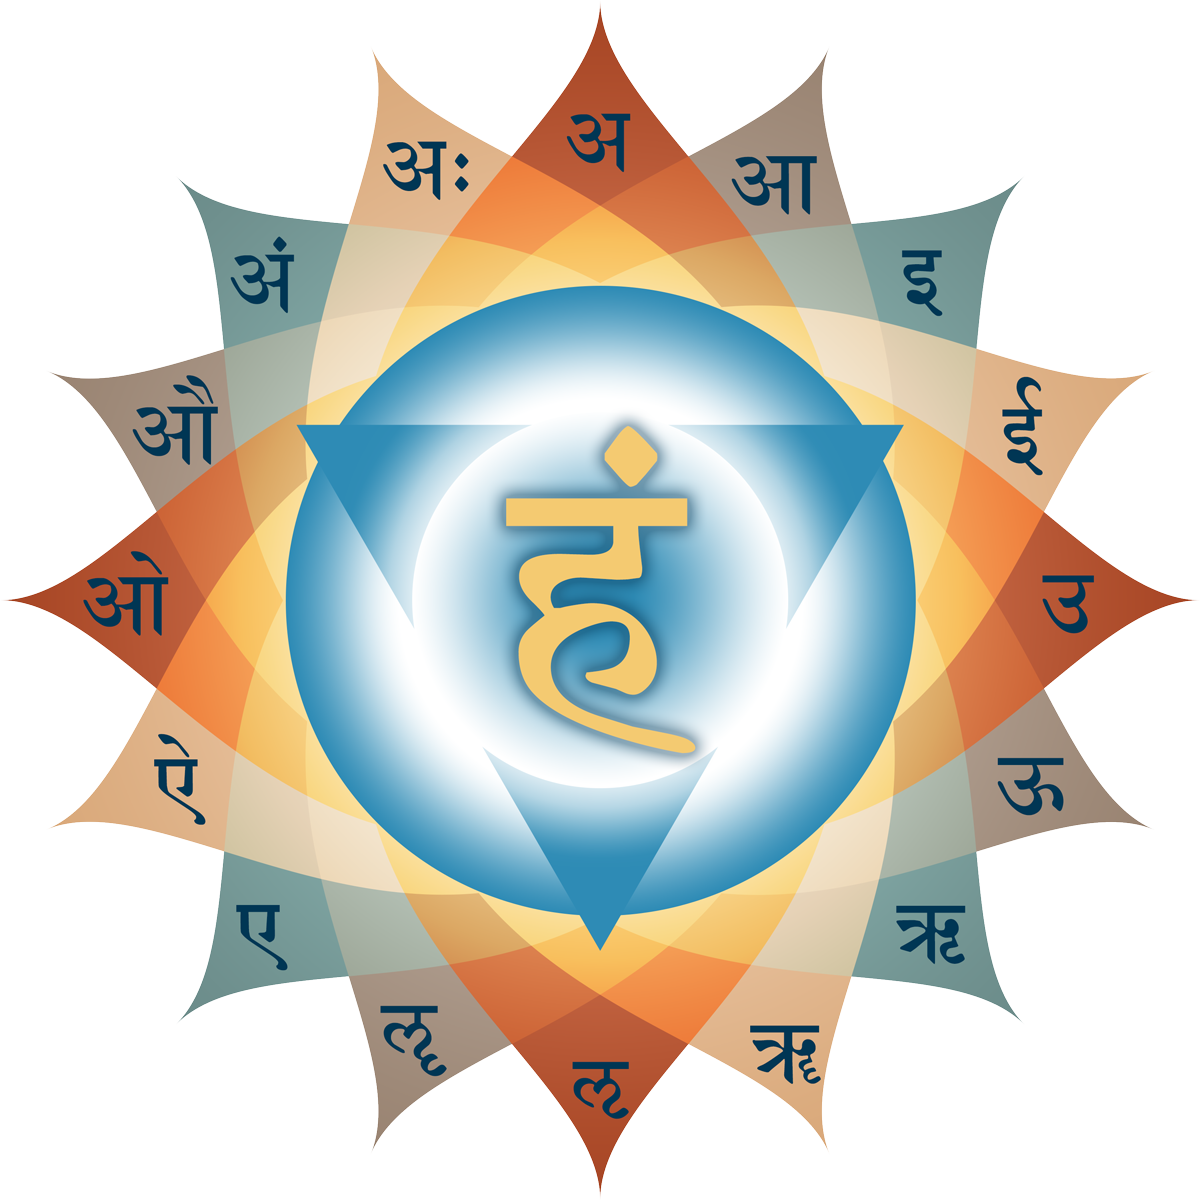 5-visuddha.png